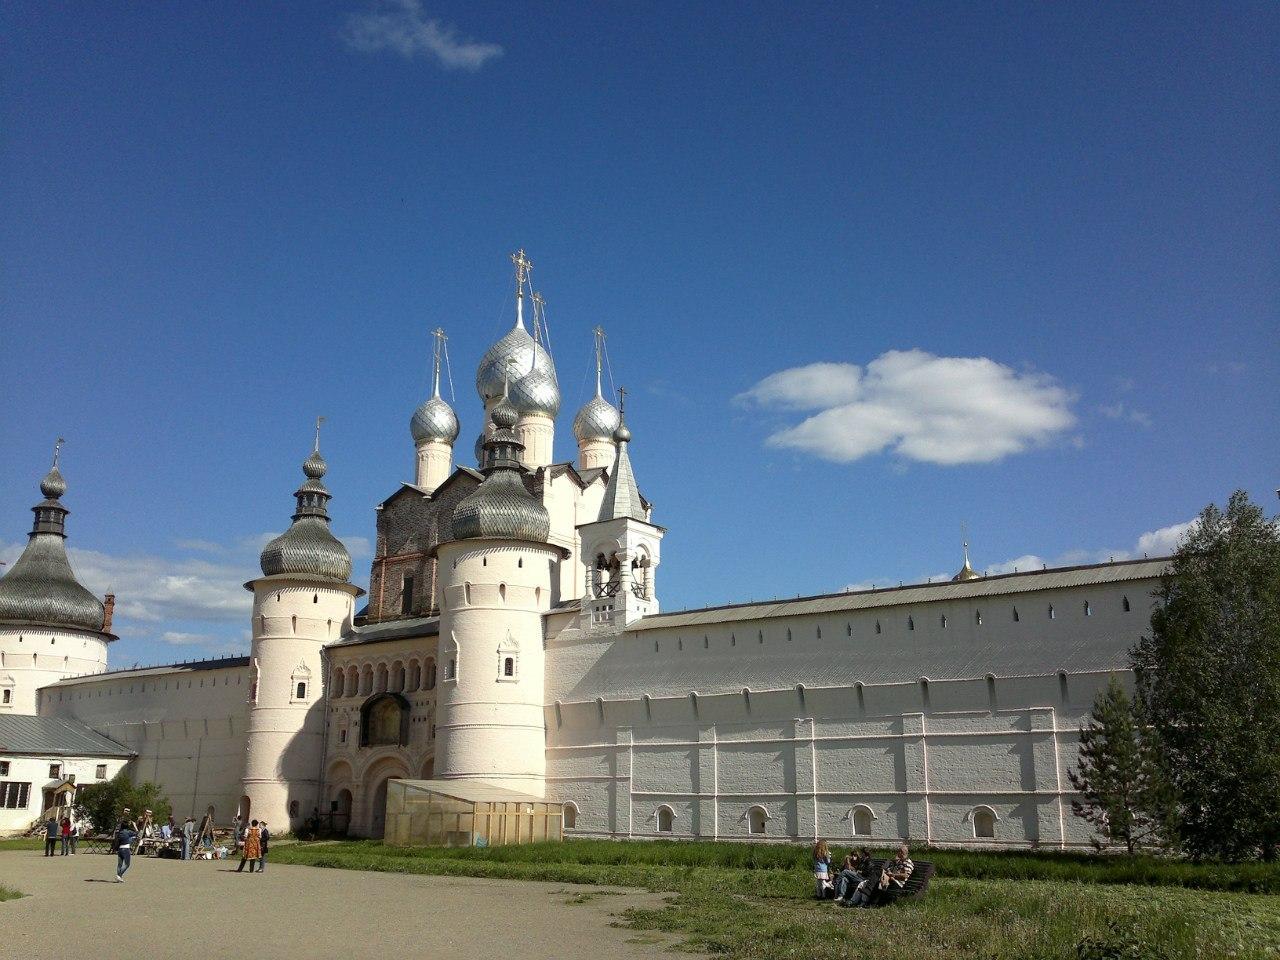 KA71XxwUELI Ростовский кремль.